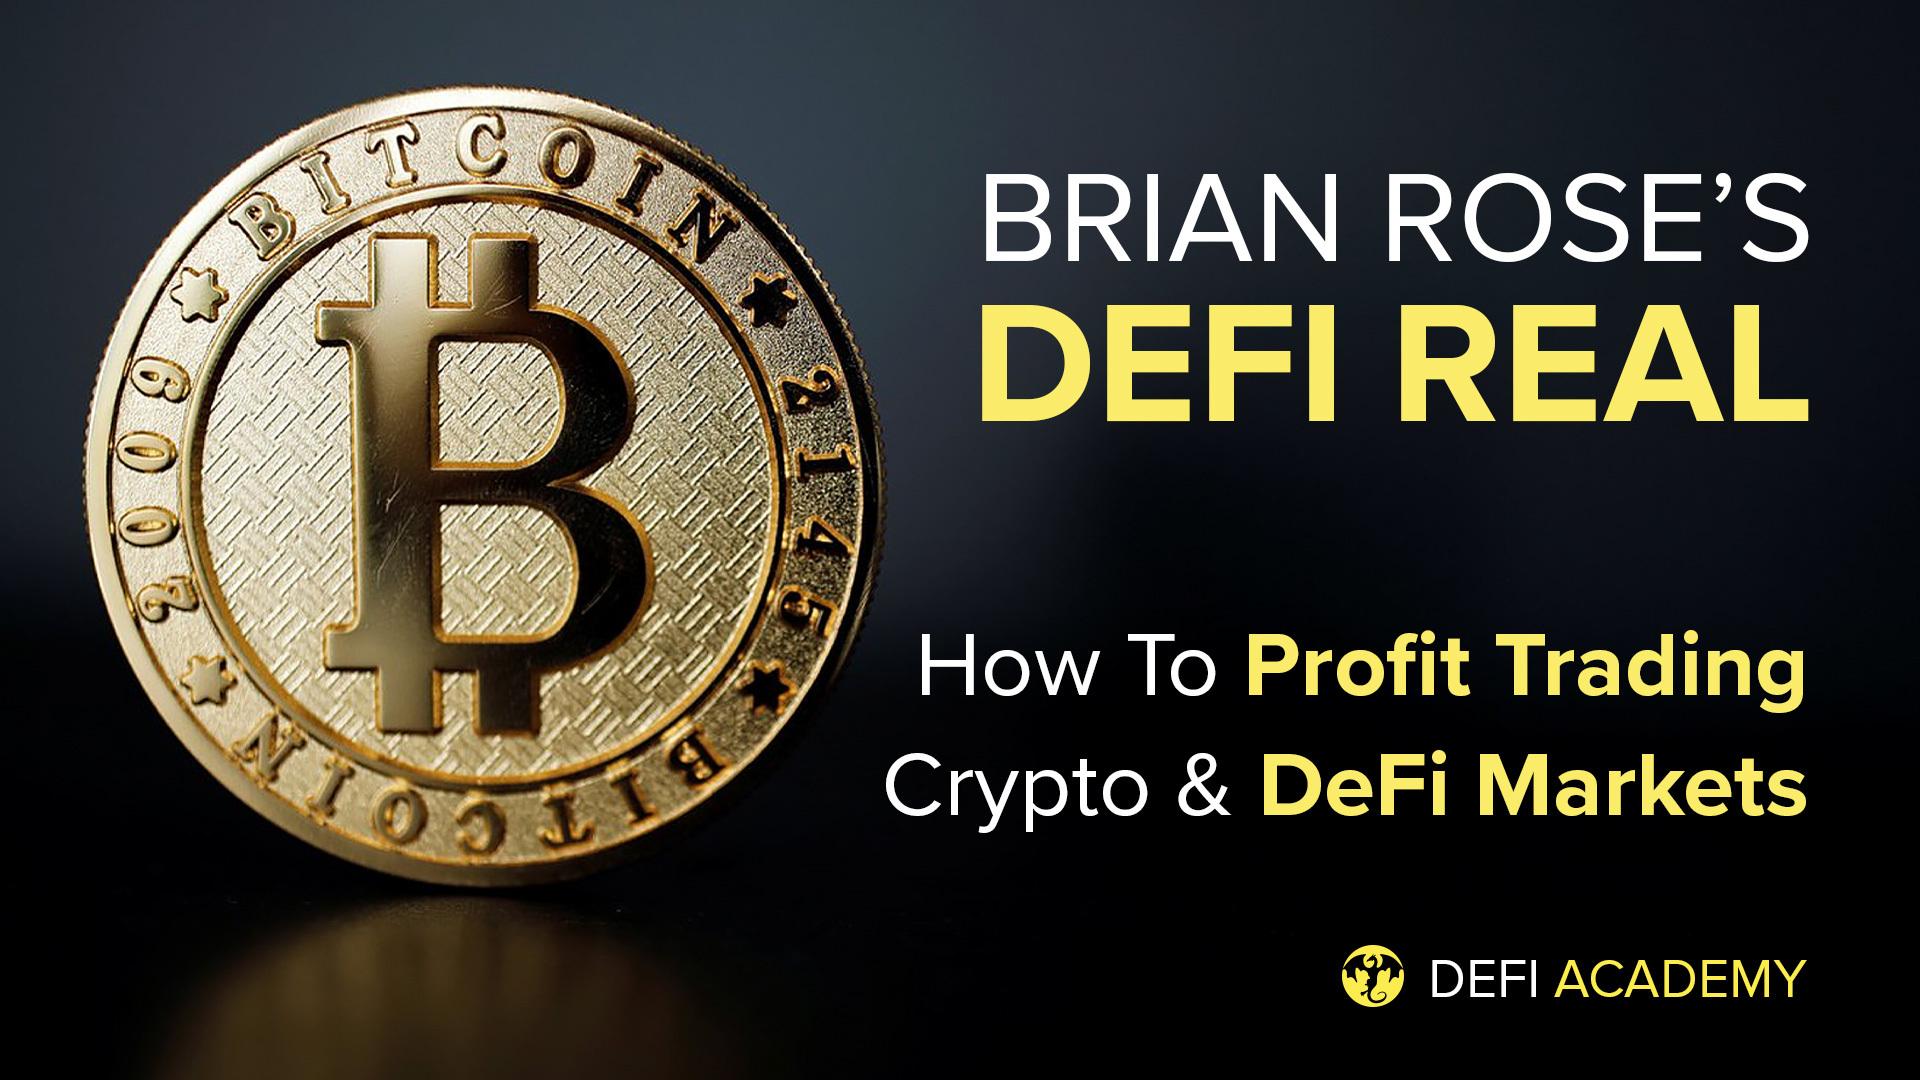 DeFi Real - How To Profit Trading Crypto & DeFi Markets